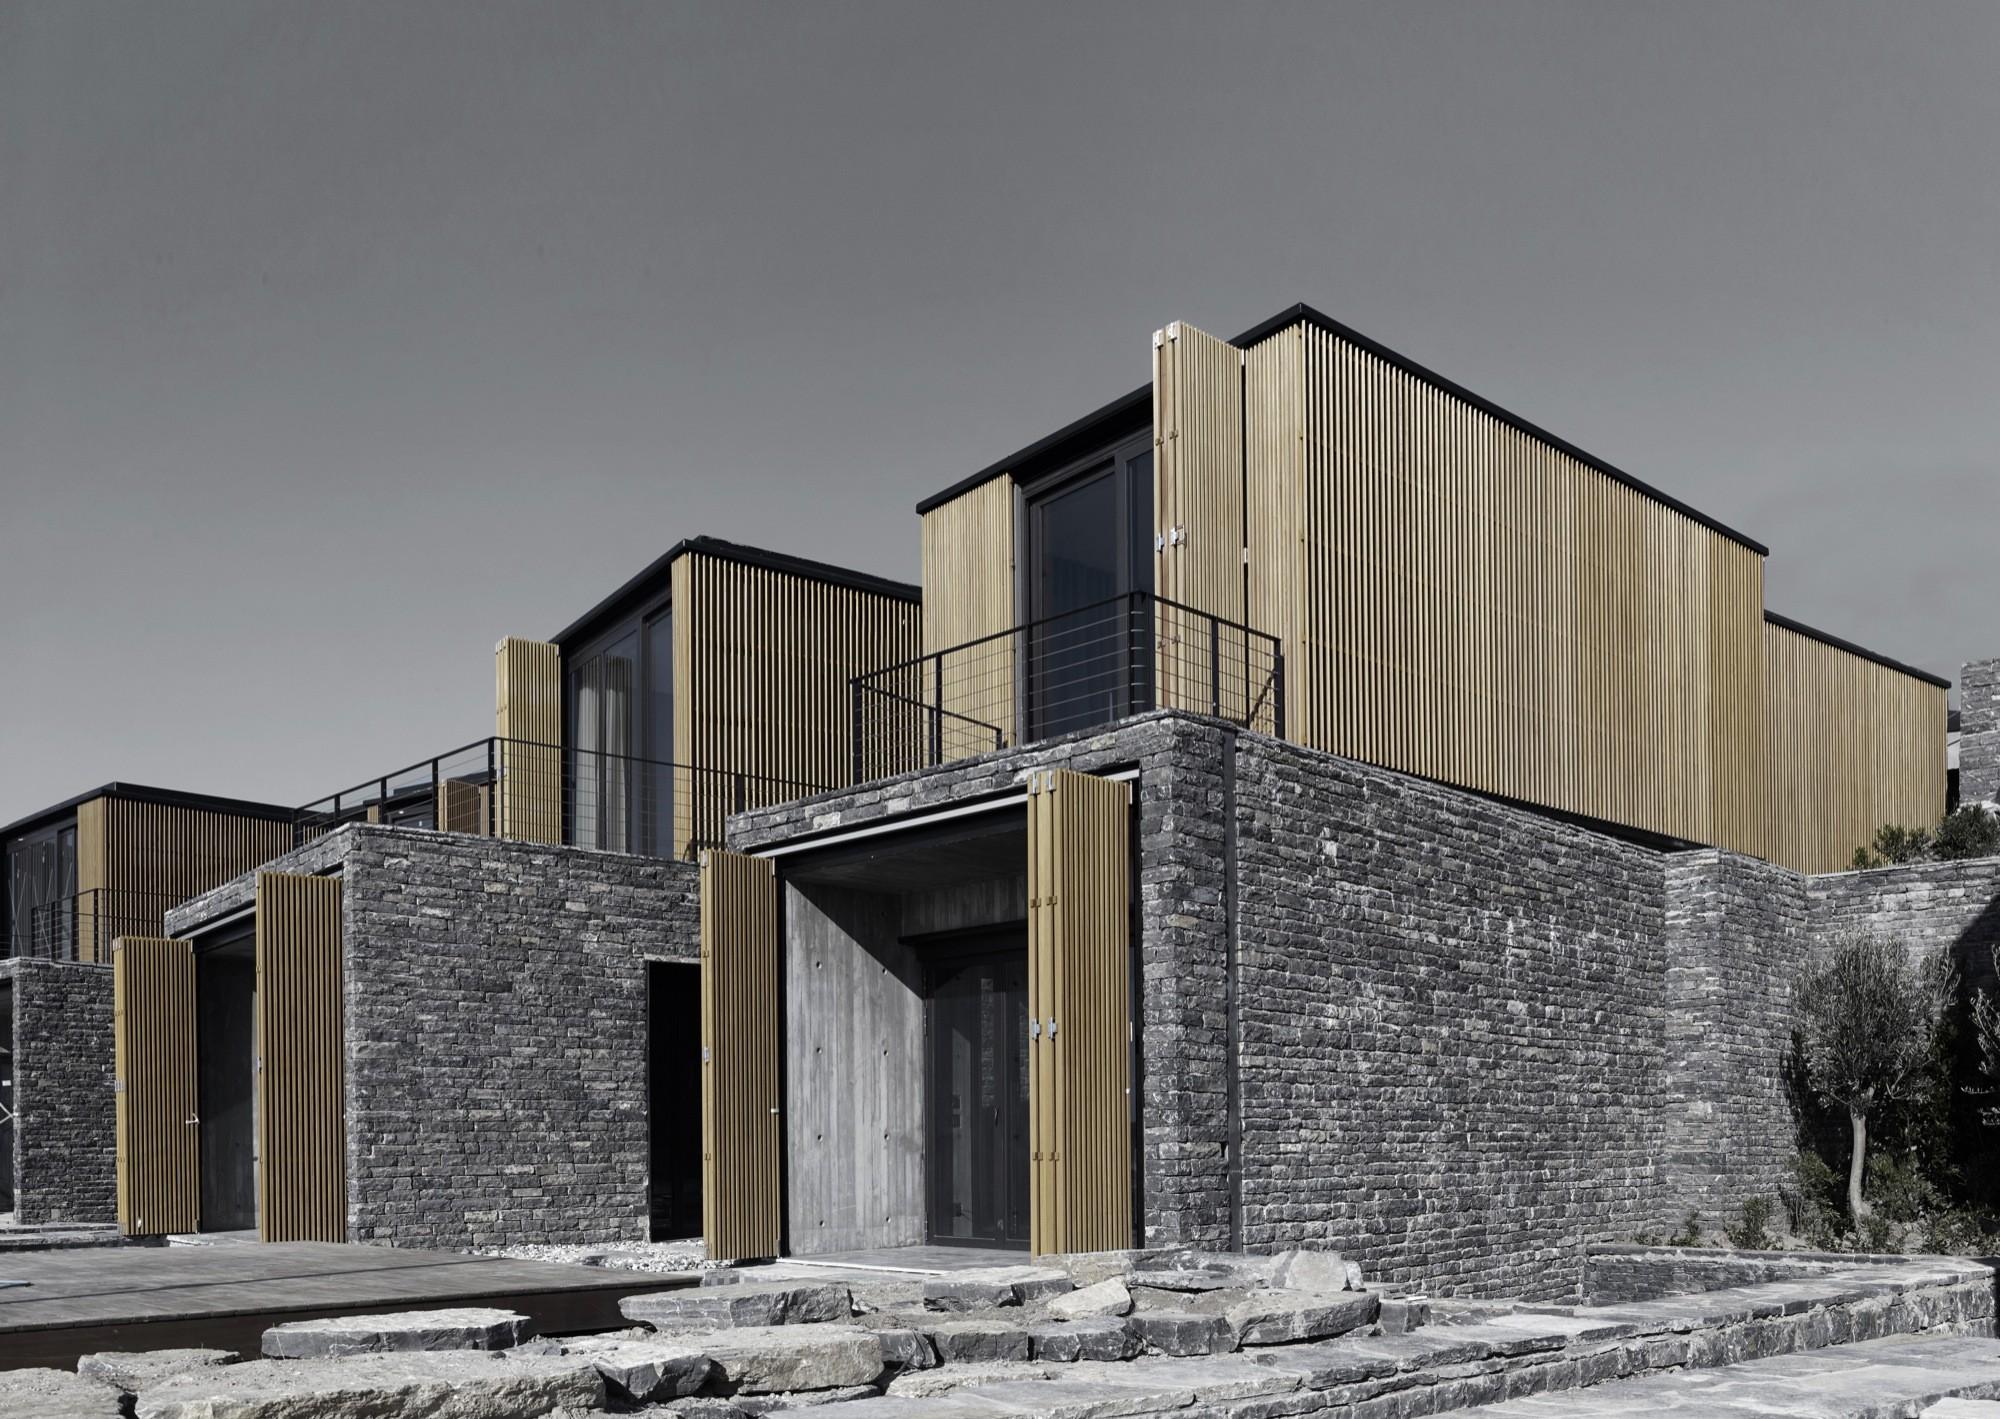 Vıcem Bodrum Resıdences / Emre Arolat Architects, © Cemal Emden